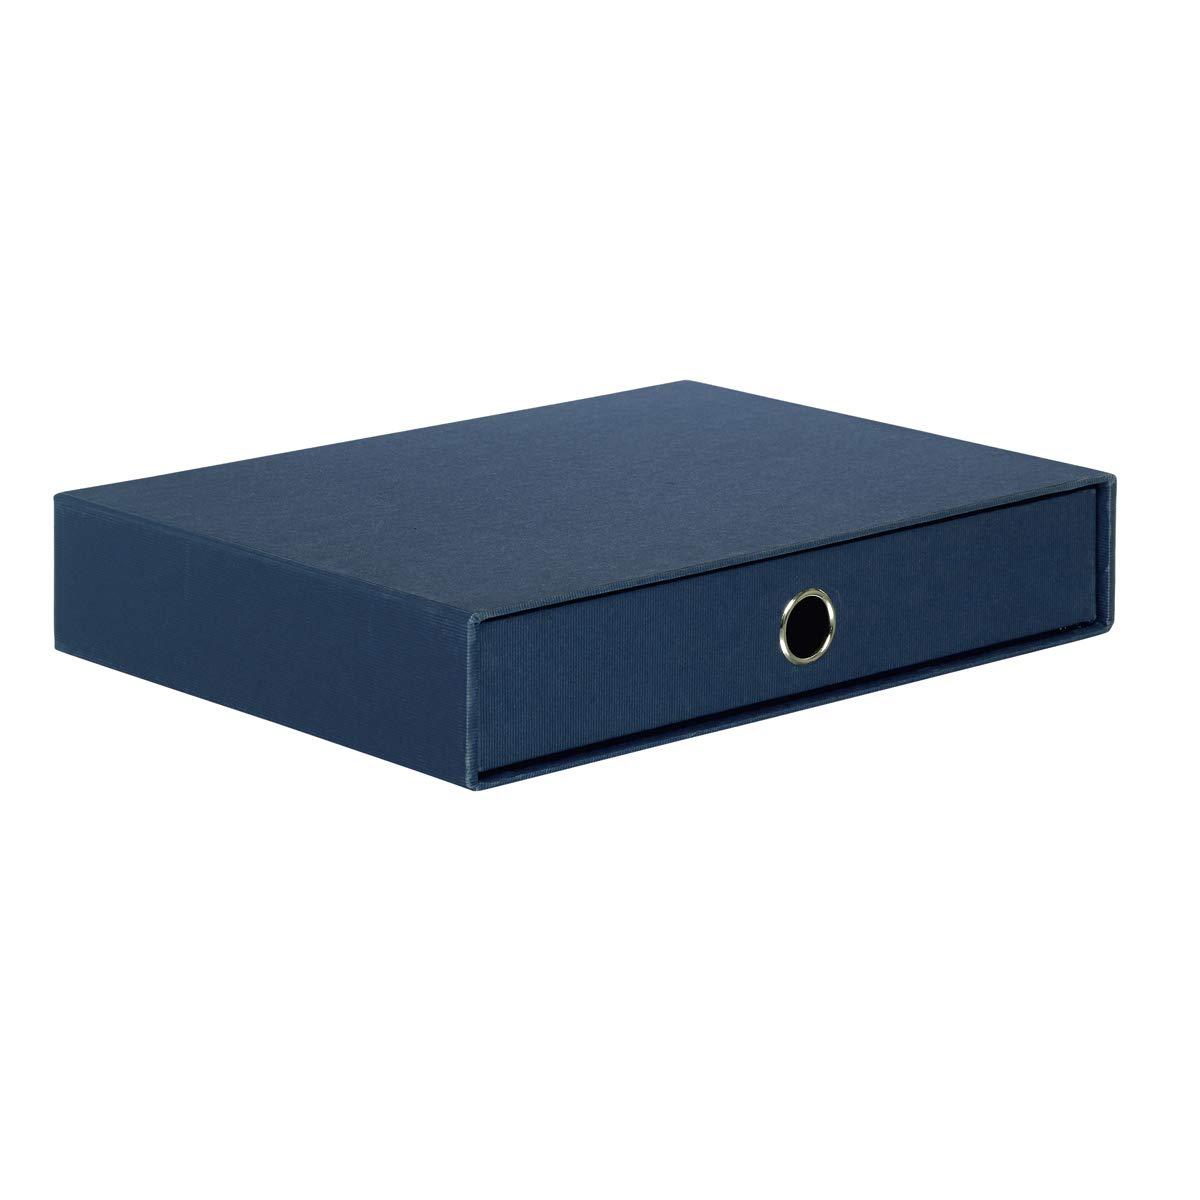 Import Allemagne R/össler 1524452900 Module de rangement Format A4 Bleu marine